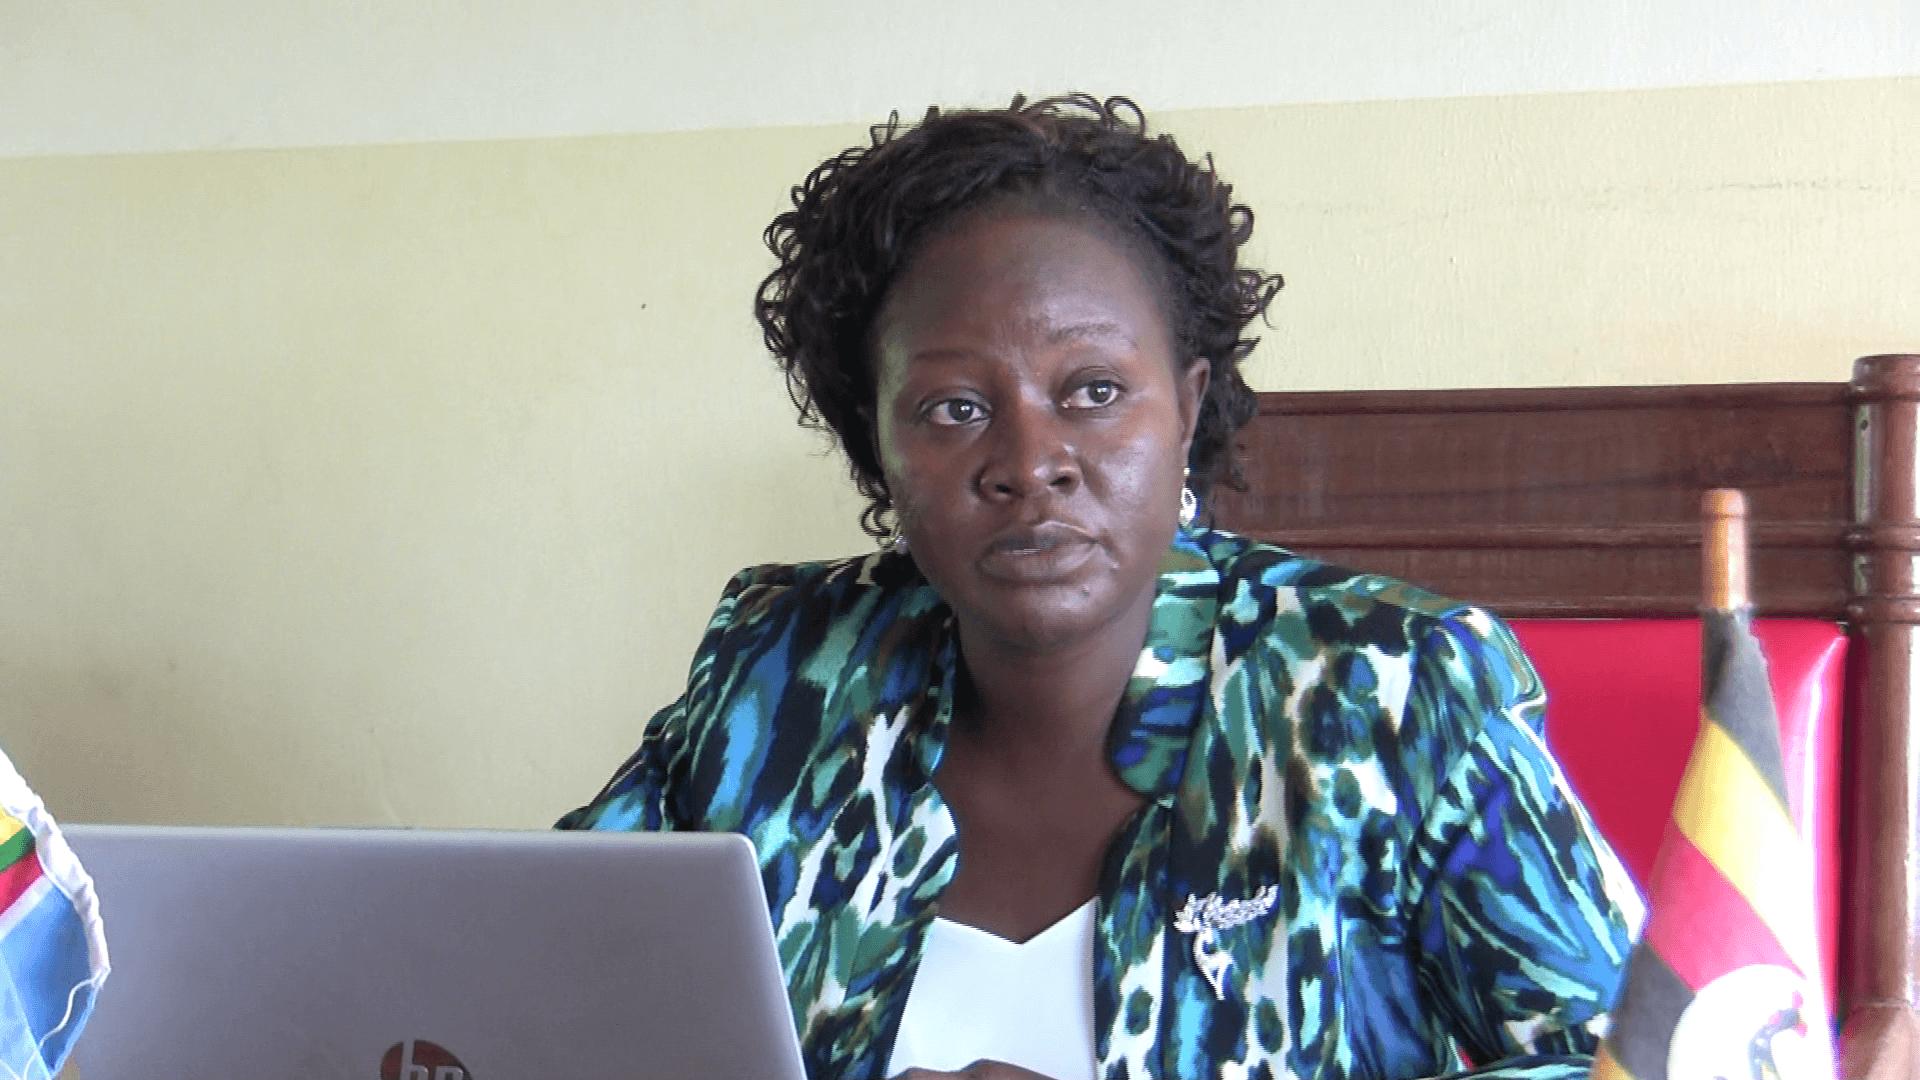 Chief Magistrate Juliet Hatanga presiding over the case today. (UhspaUganda photo)